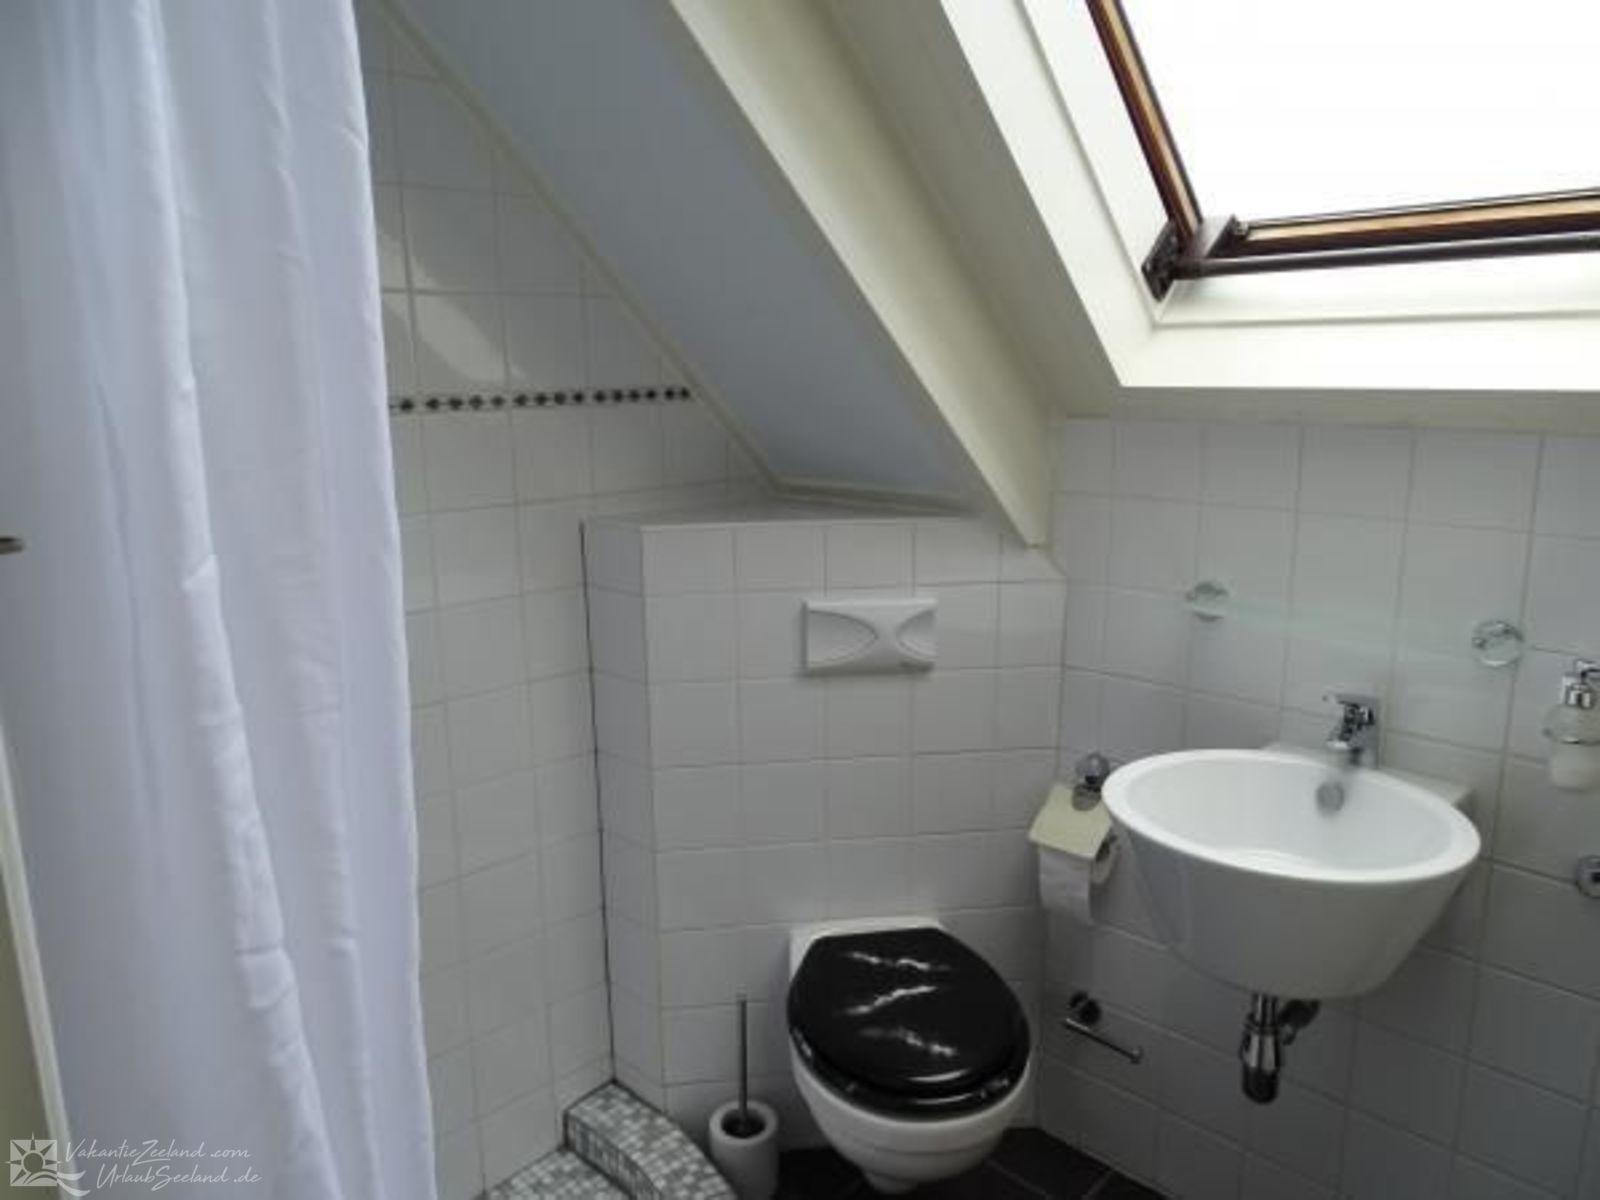 VZ757 Luxuriöses Ferienhaus in Ouddorp